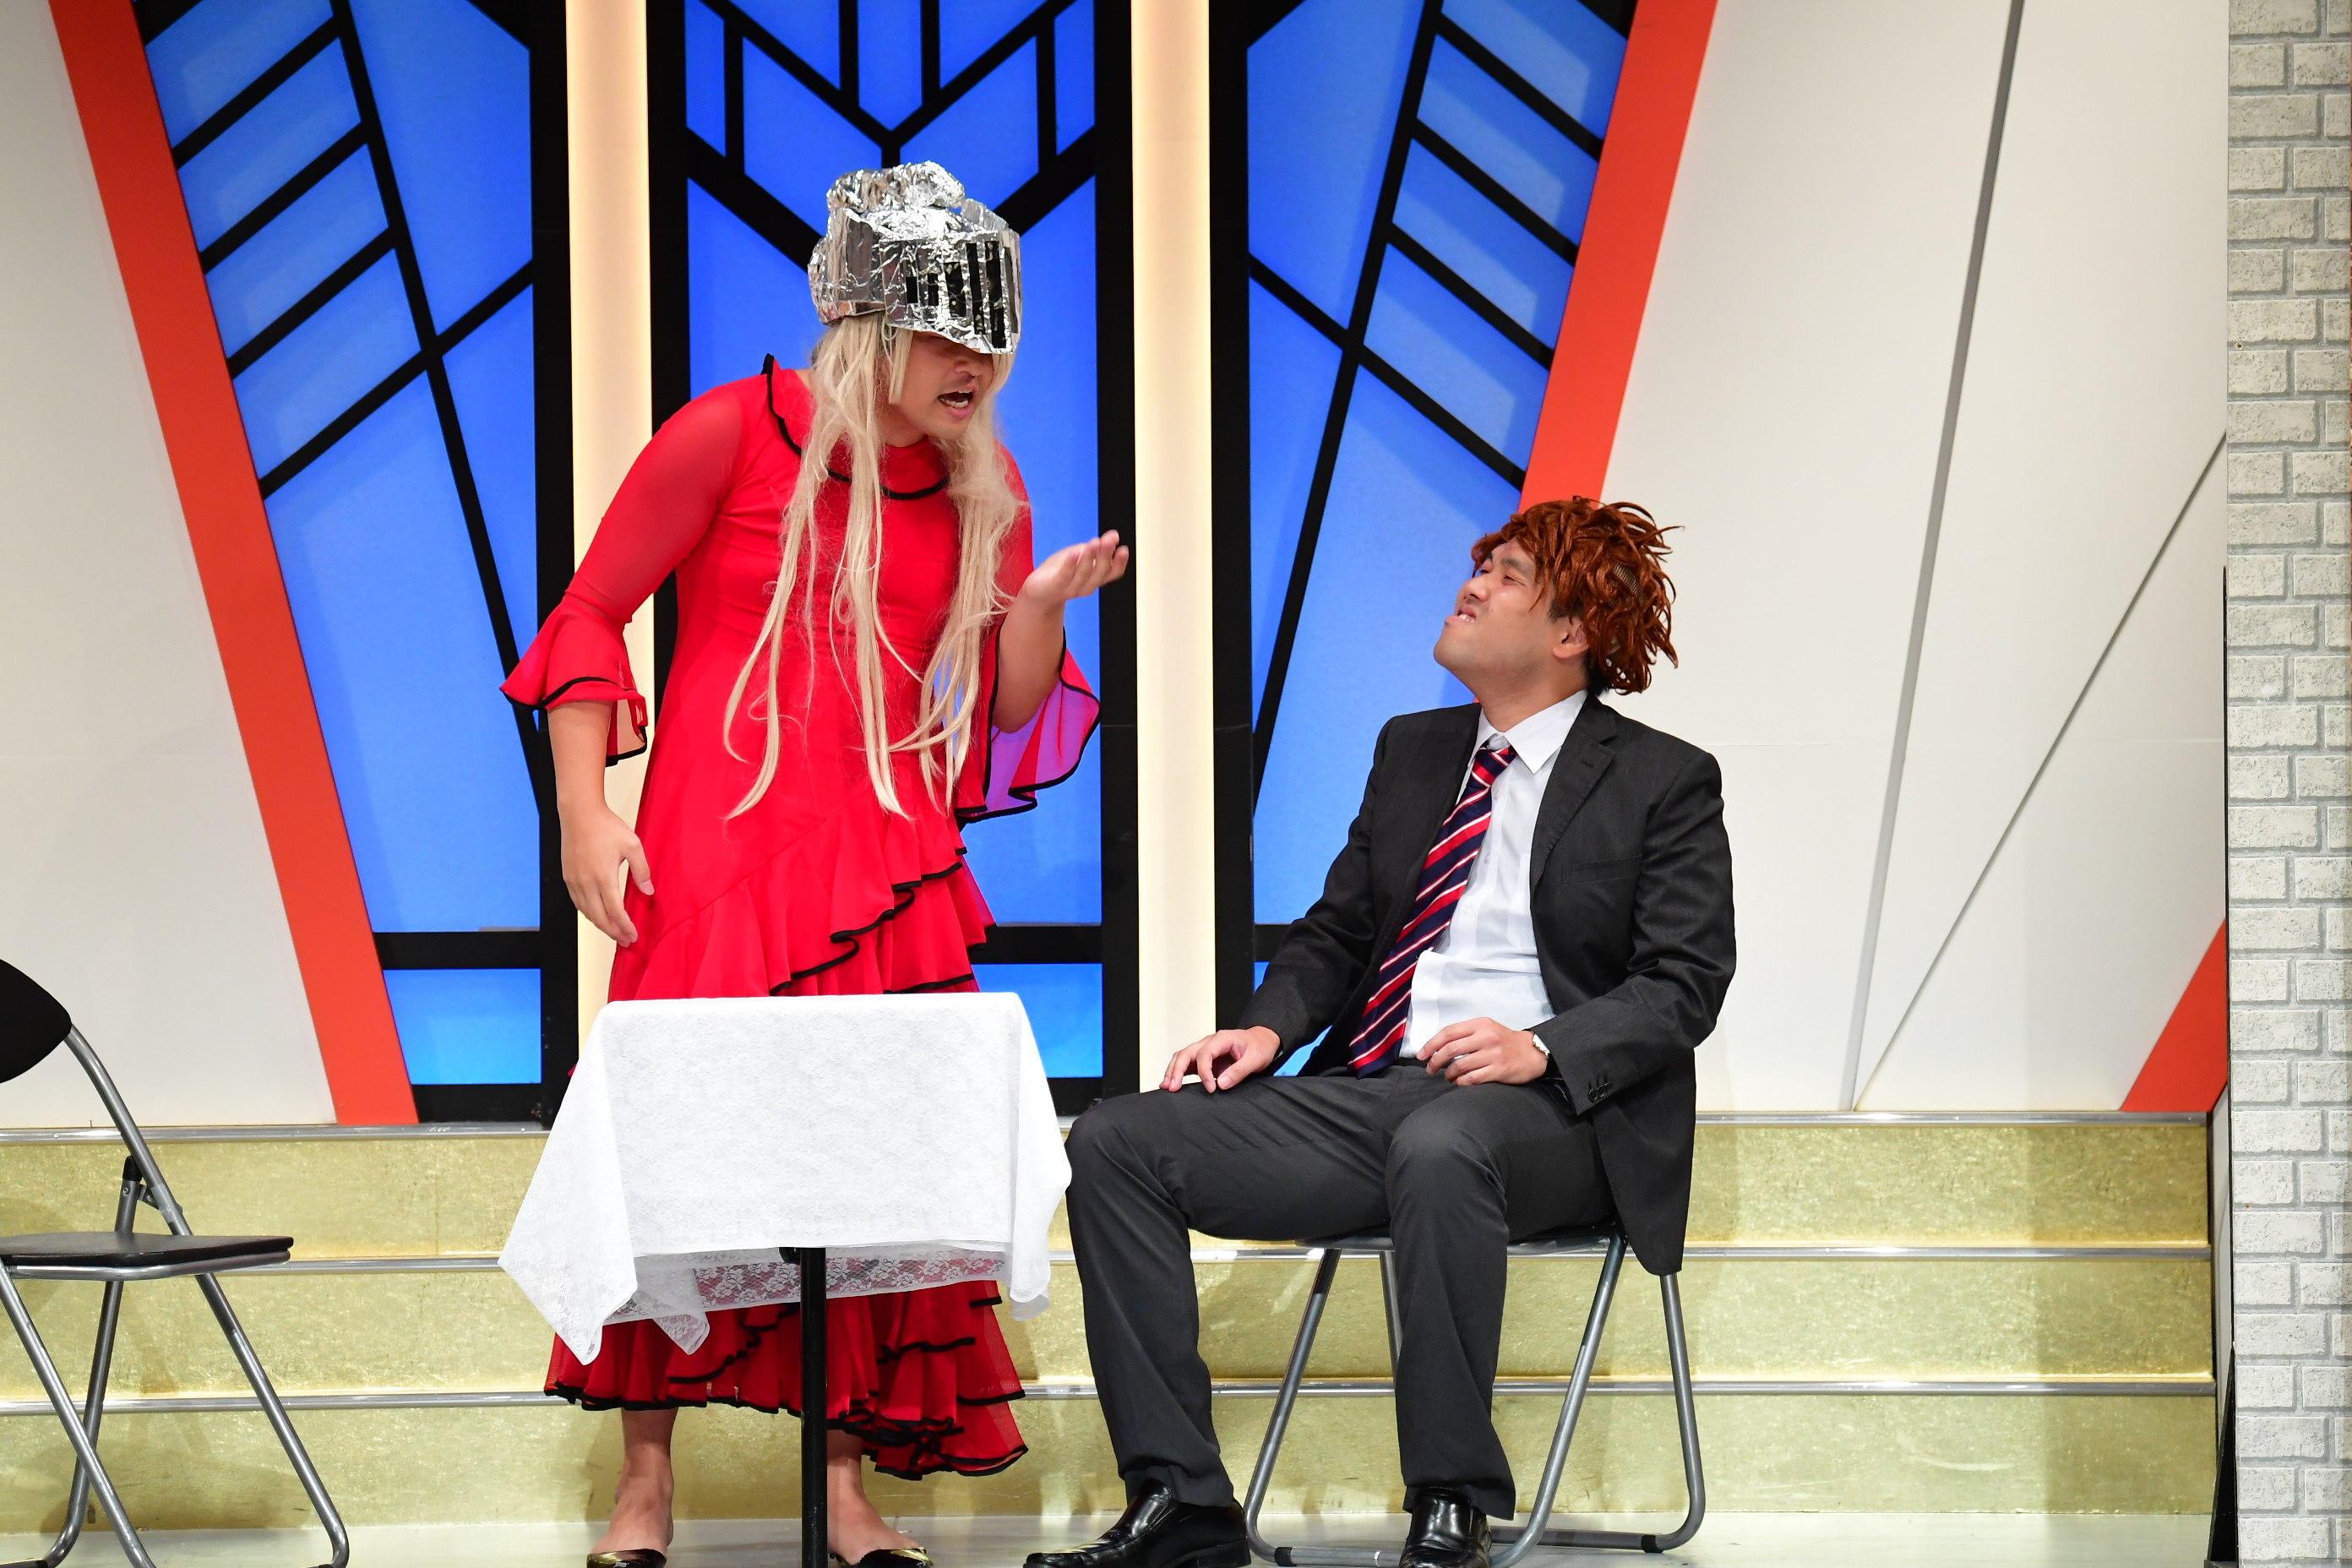 http://news.yoshimoto.co.jp/20180925141900-4a6767910d1a2e55b8da8d08af1fe4c211593b1e.jpg